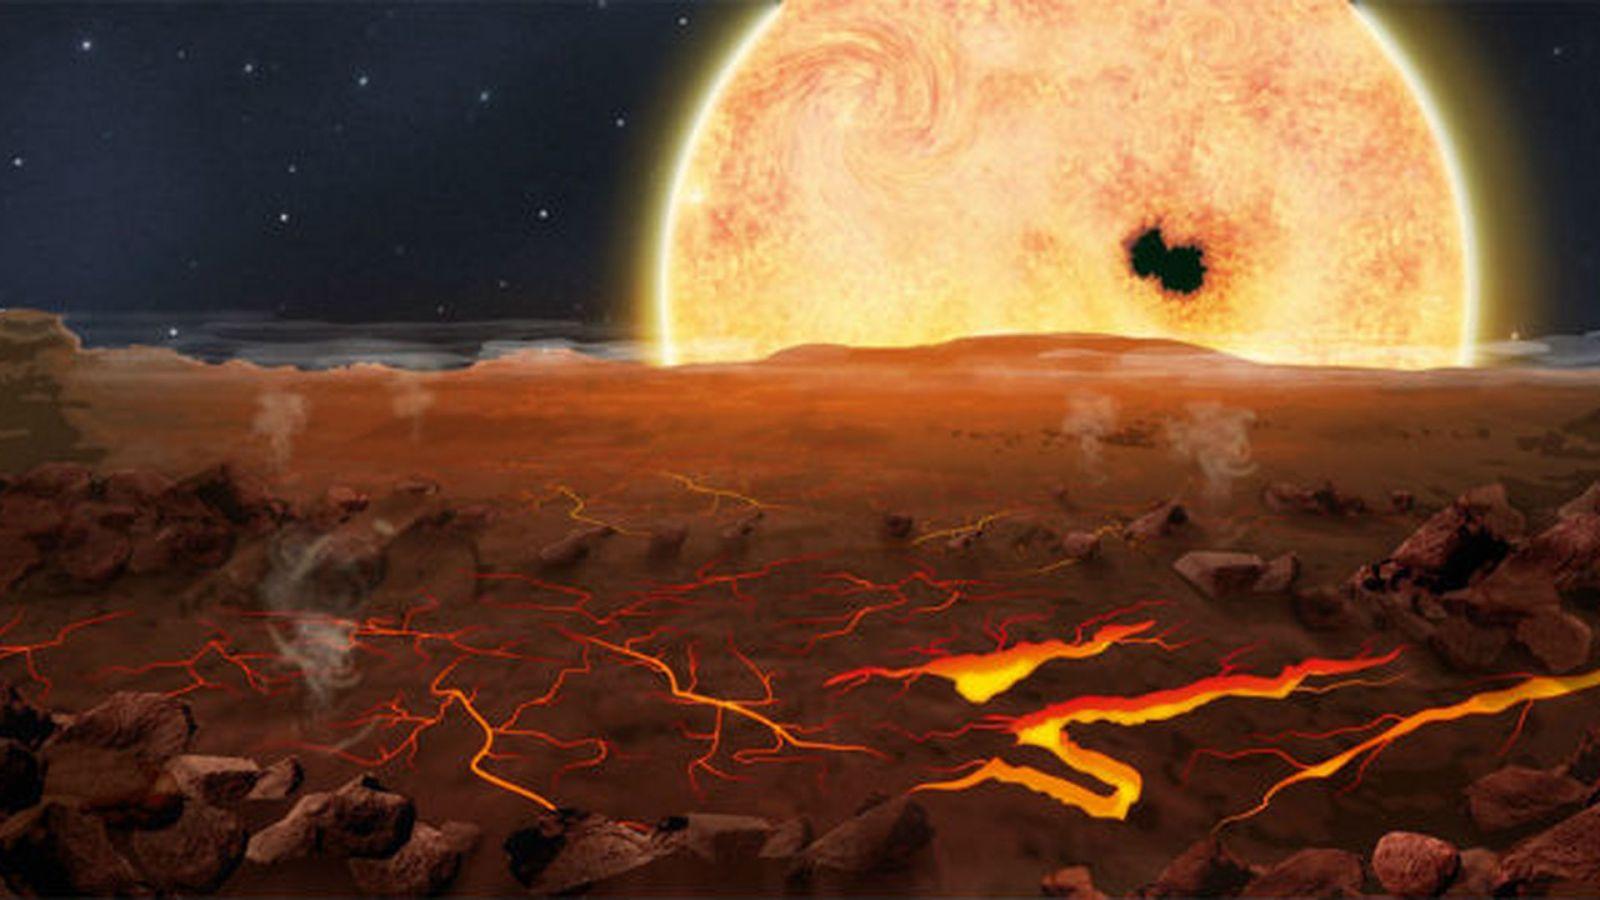 Kepler 78b - похожа на Землю, но горяча